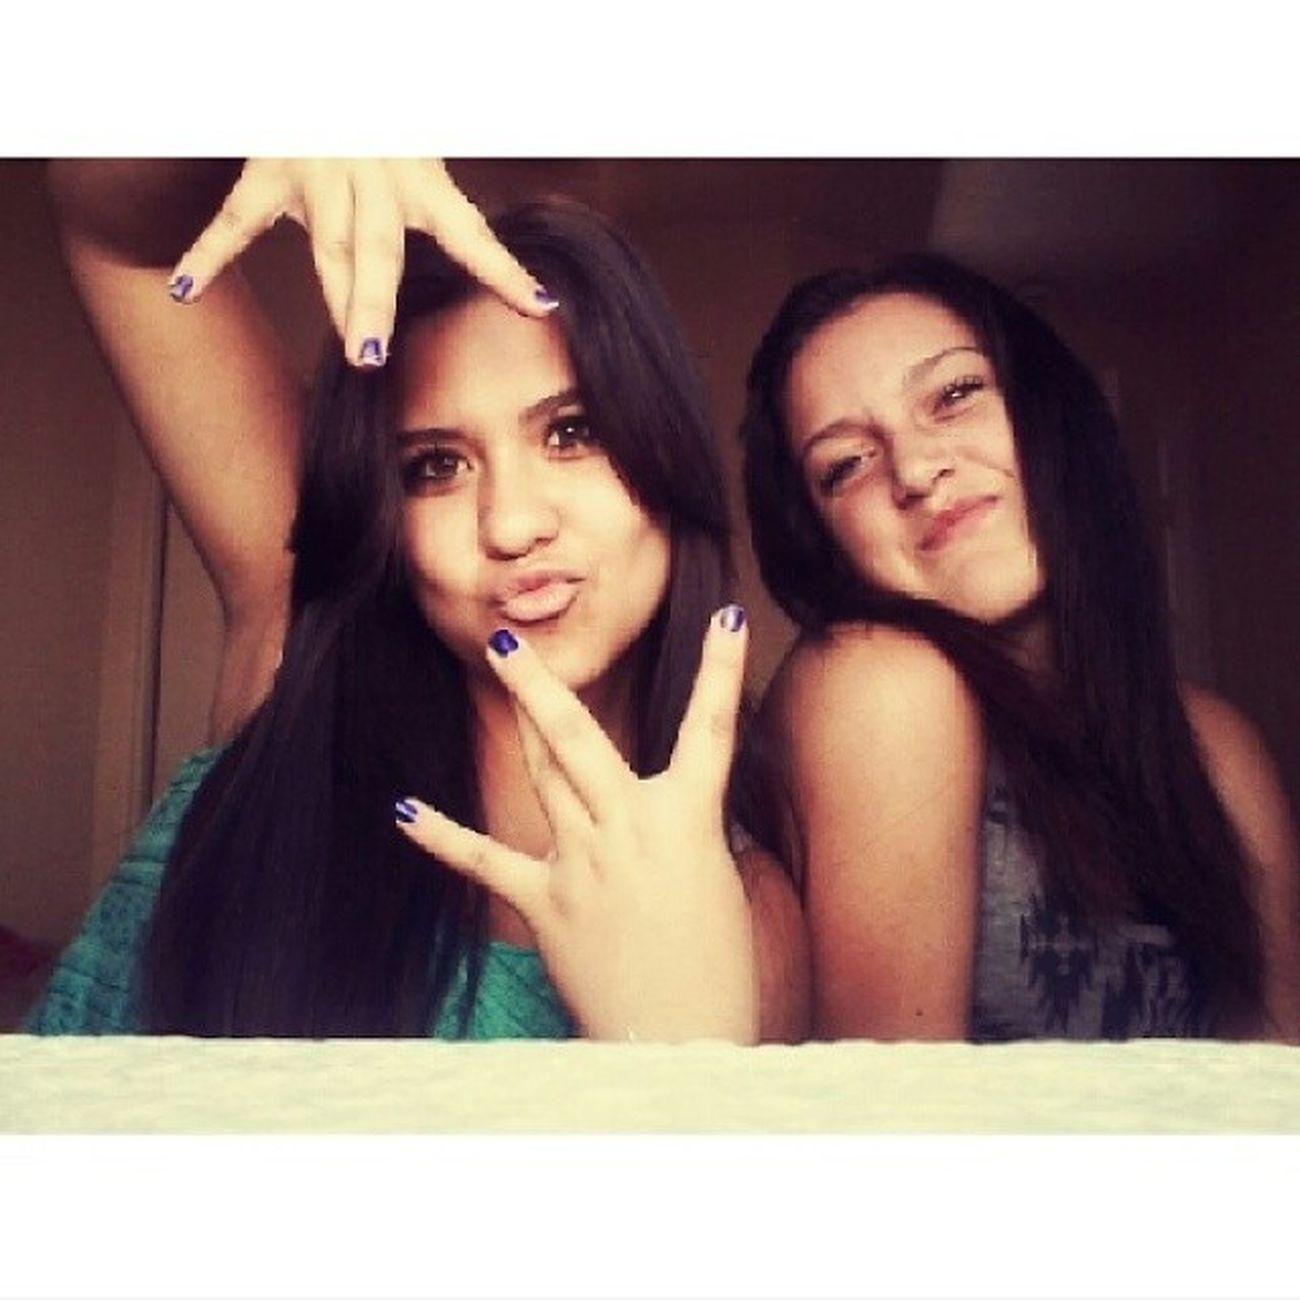 Us! ☺??? Sisterr Bestfriend